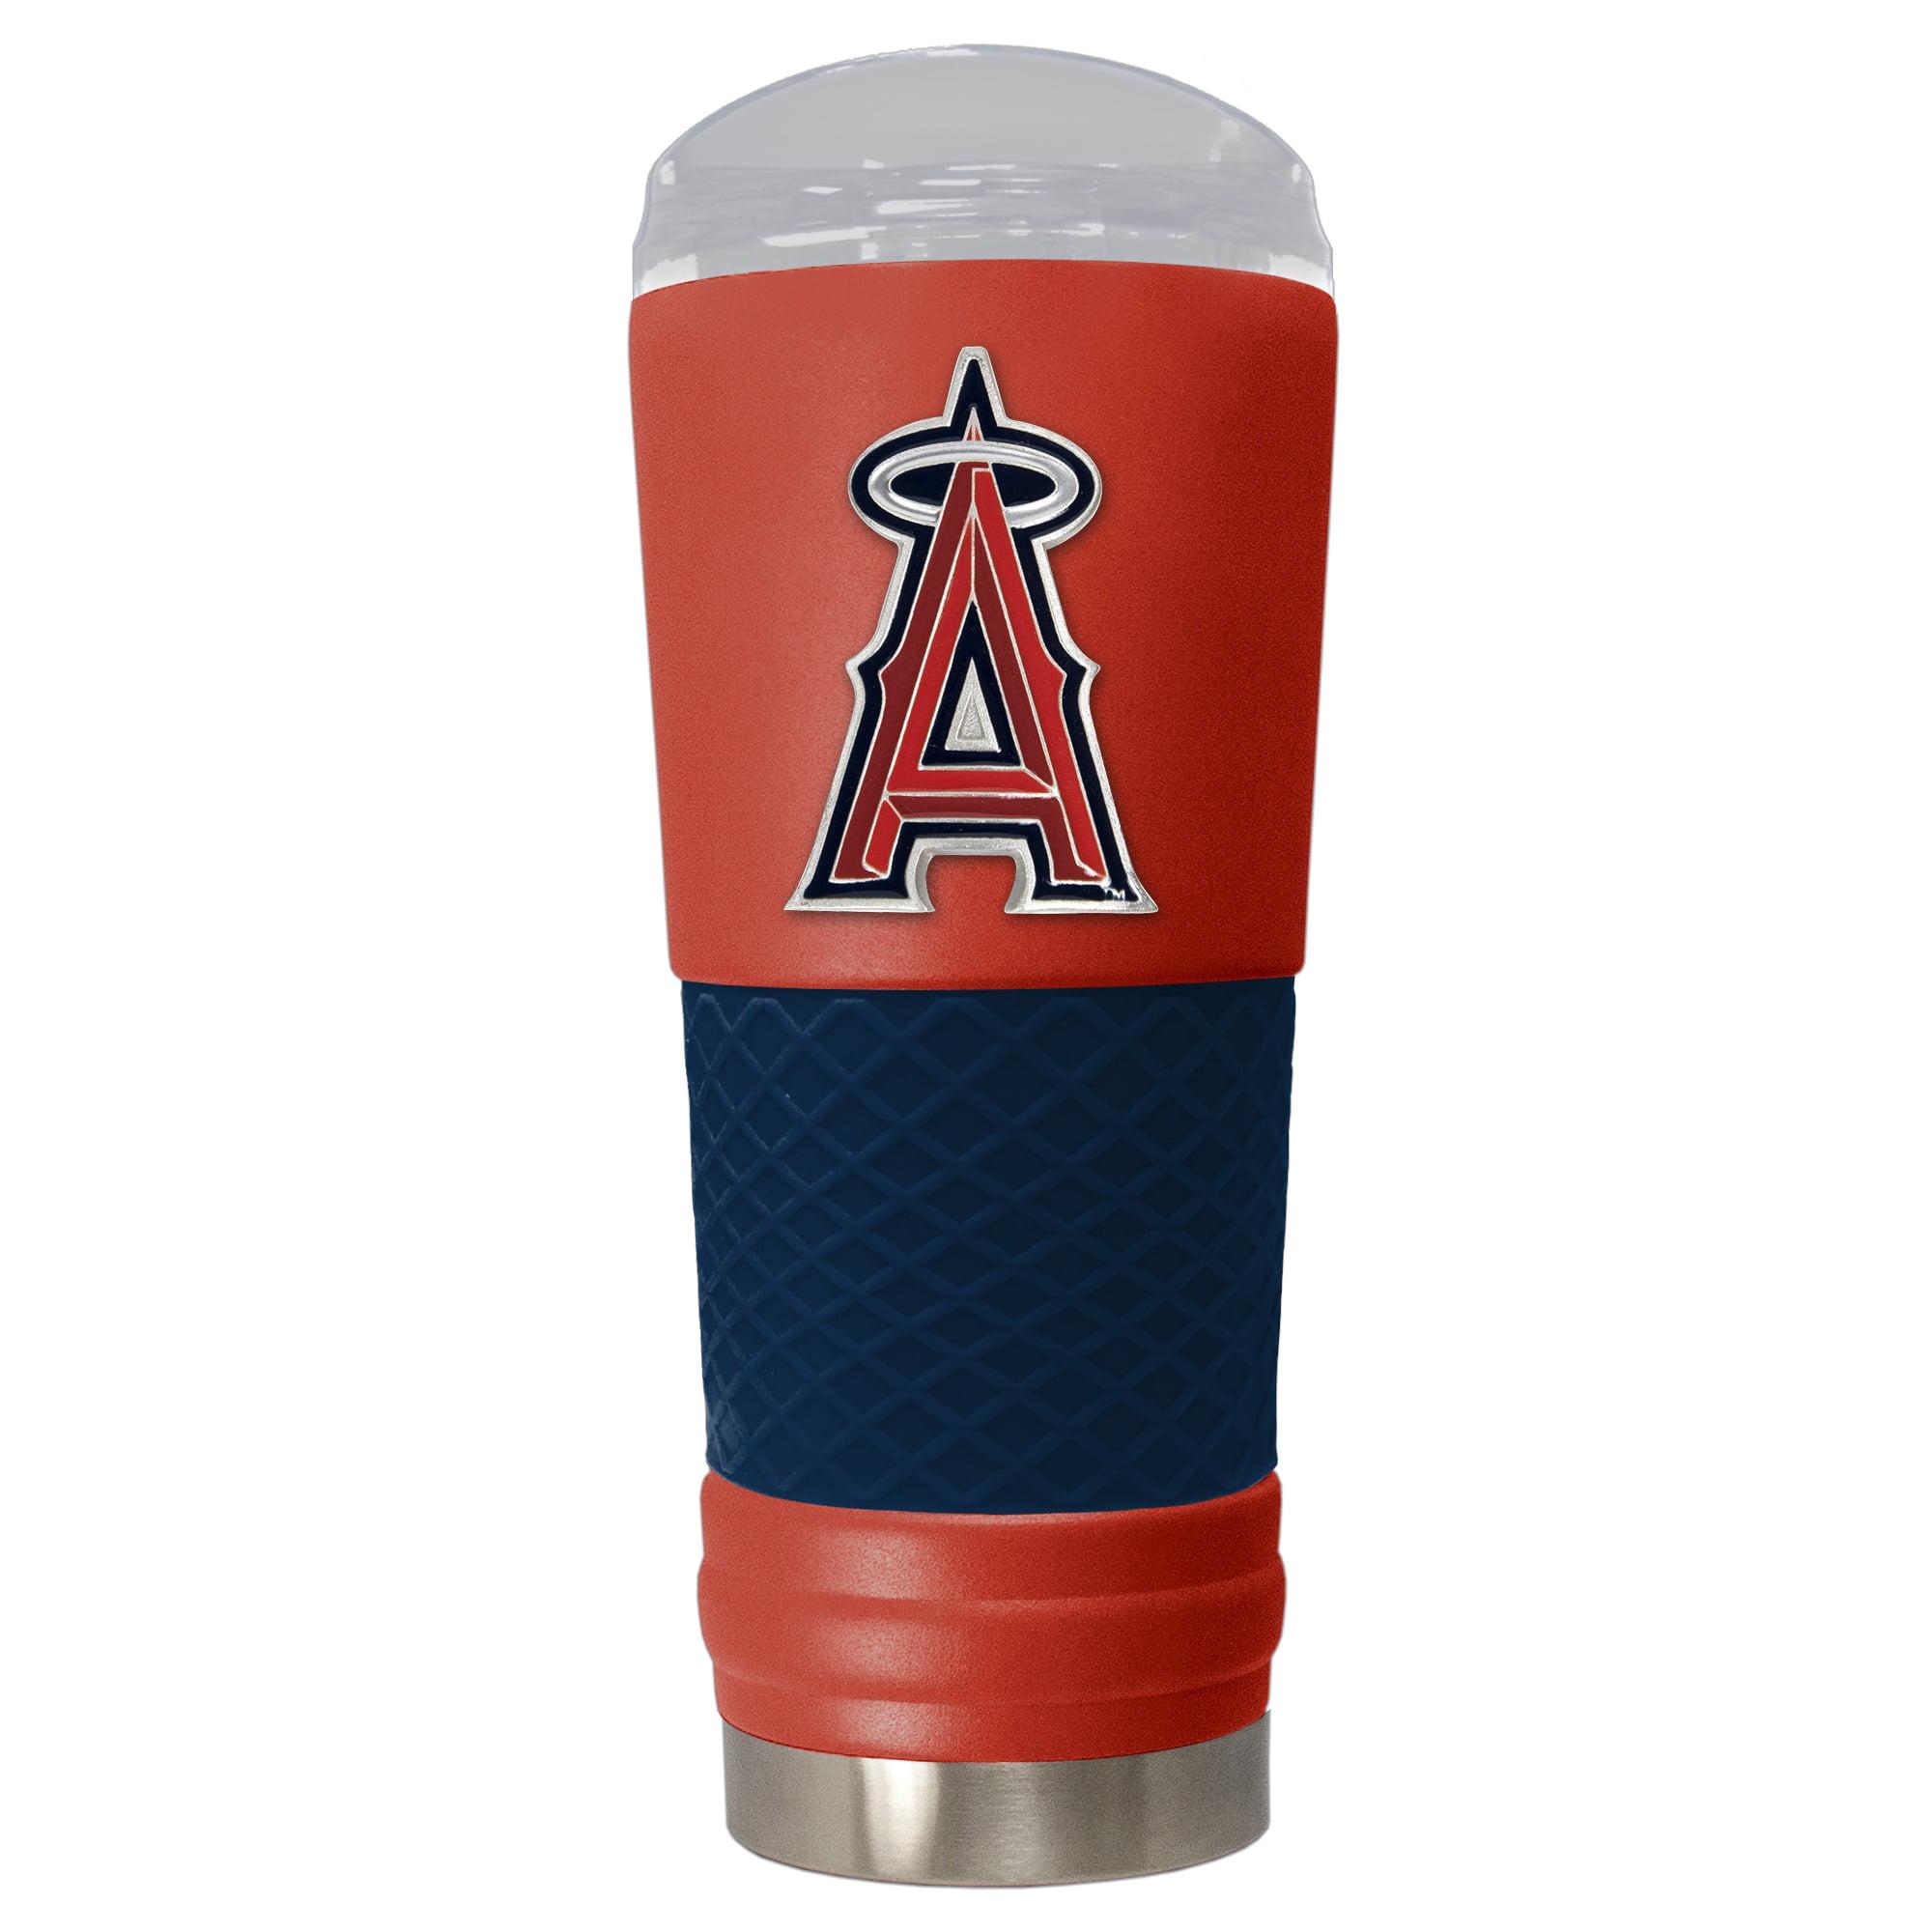 Los Angeles Angels 24oz. Powder Coated Draft Travel Mug - Red - No Size